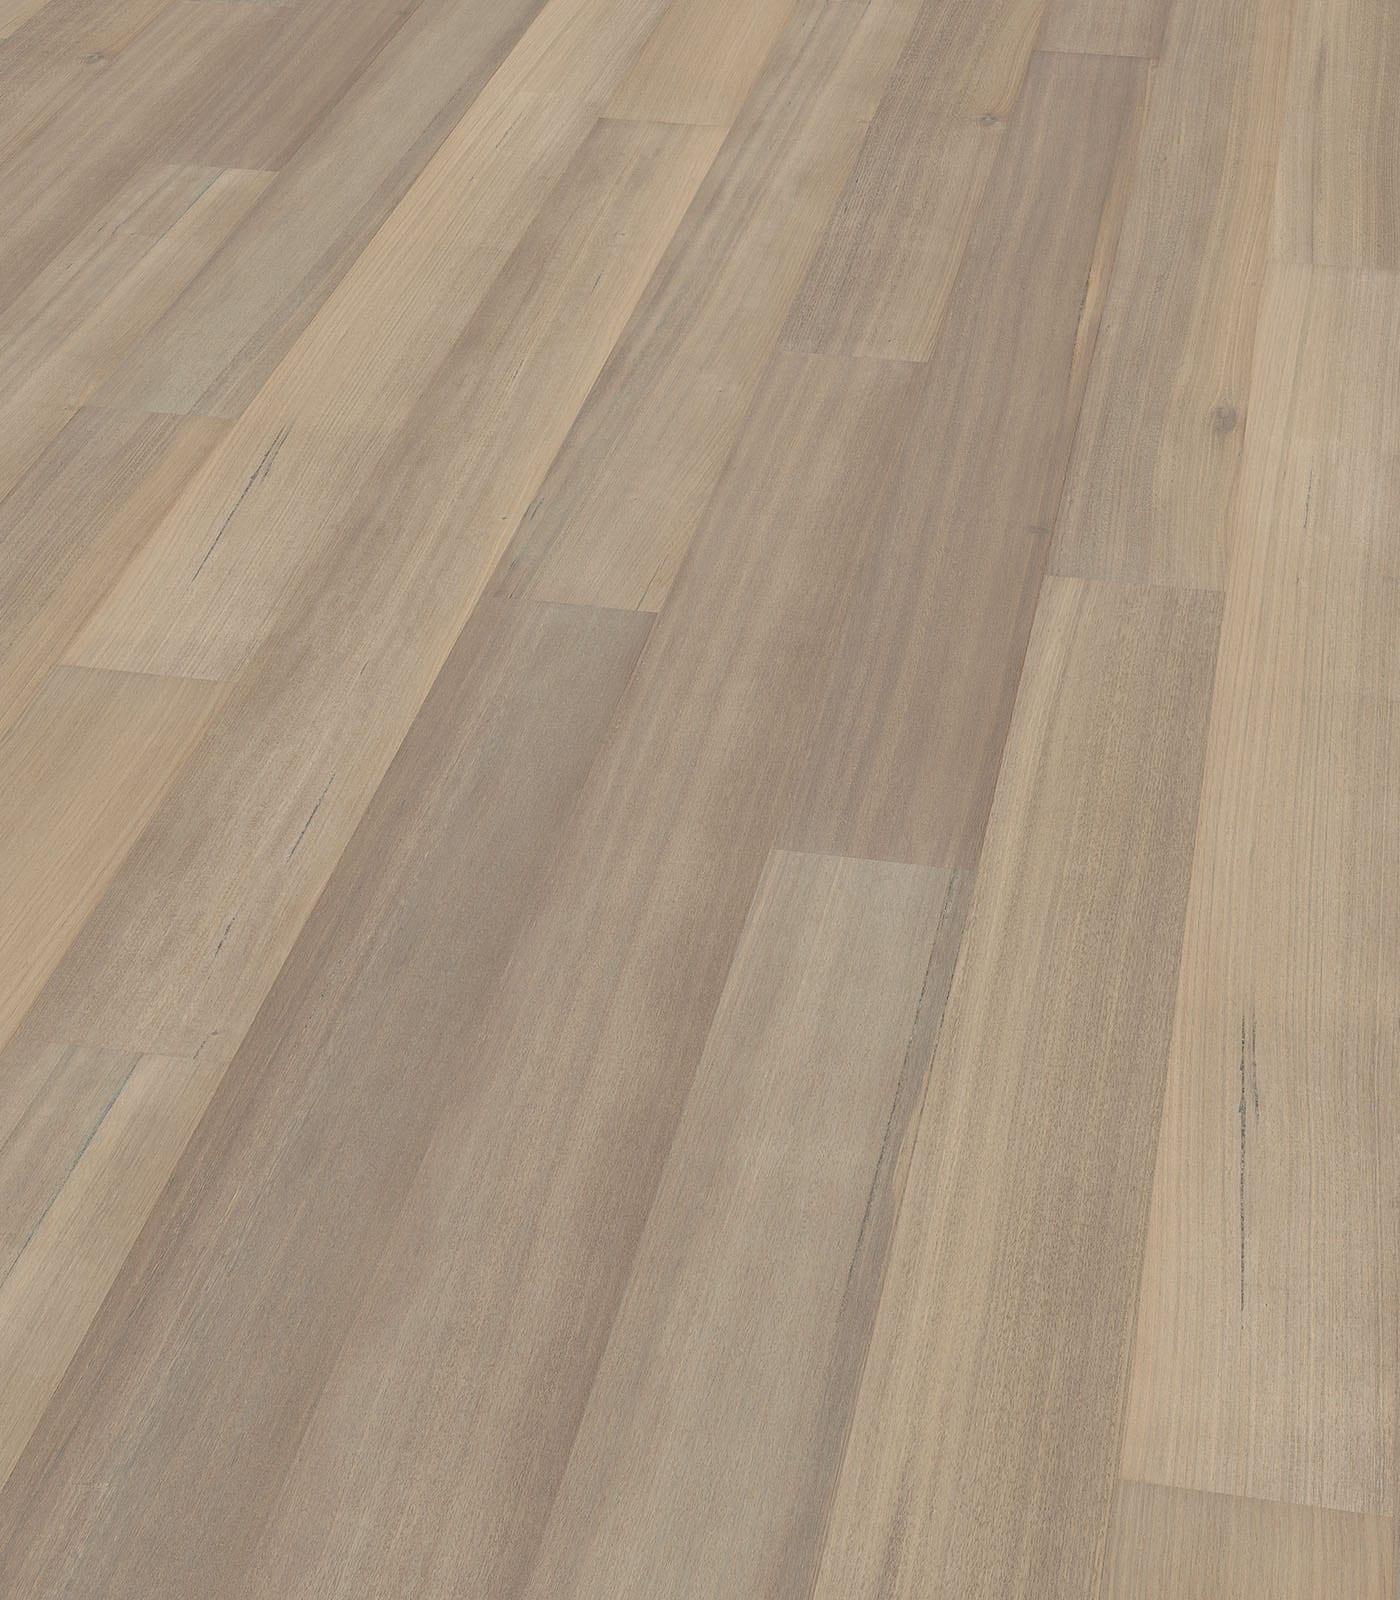 Sydney-After Oak Collection-Tasmanian Oak floors